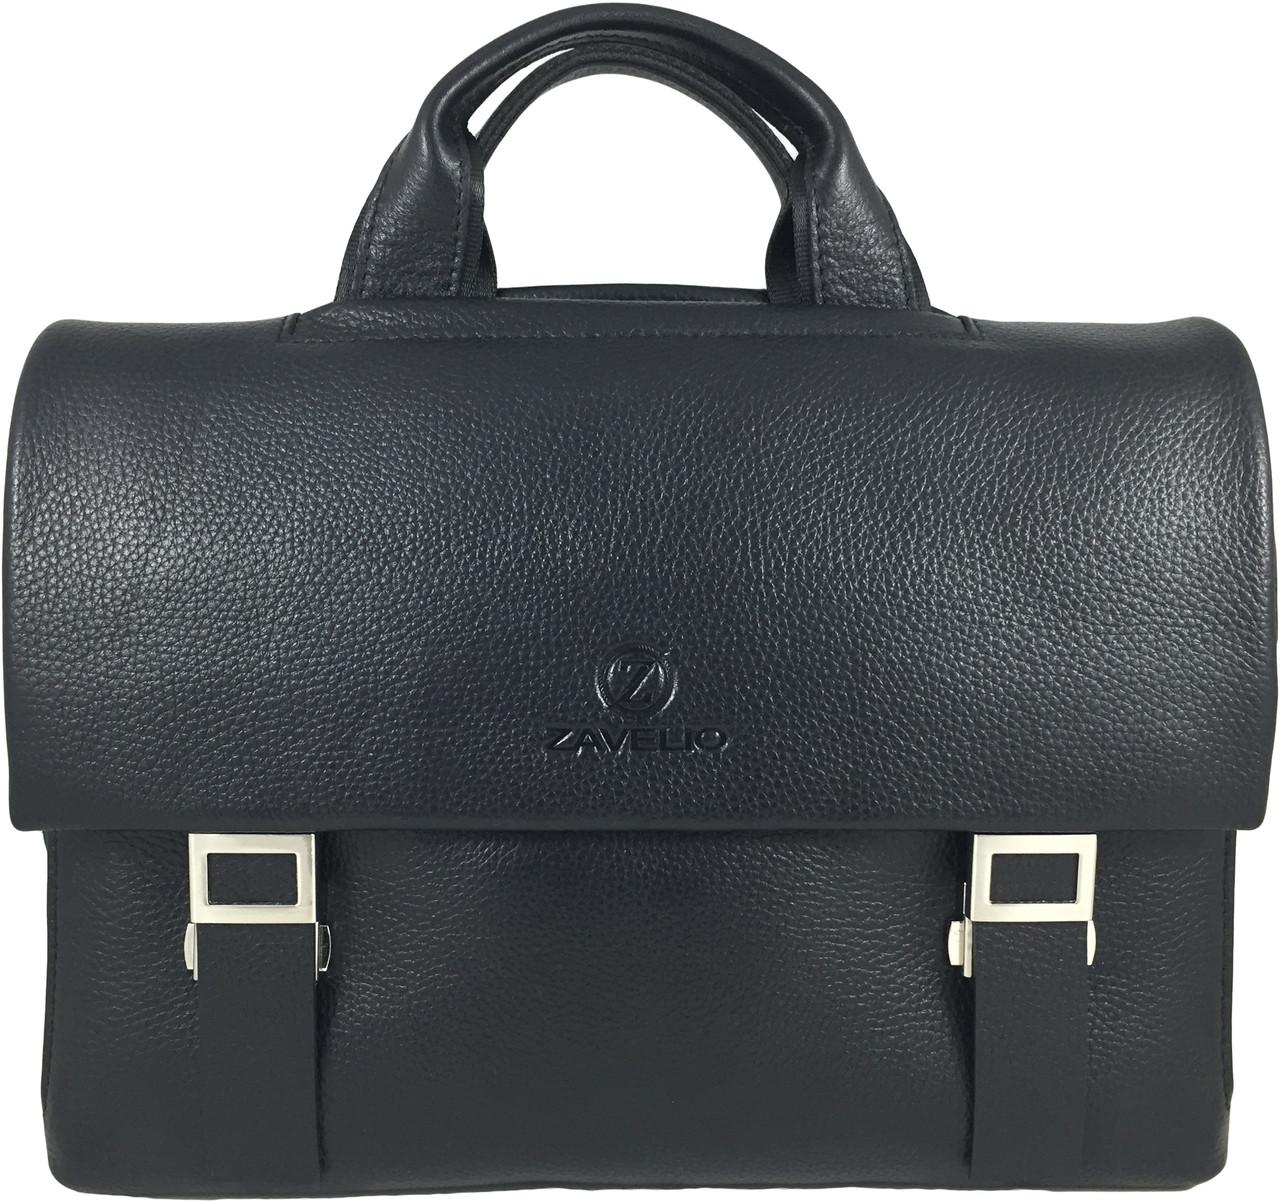 46a6d18a8bcbad Zavelio Men's Genuine Leather Briefcase Twin Buckle Shoulder Laptop ...